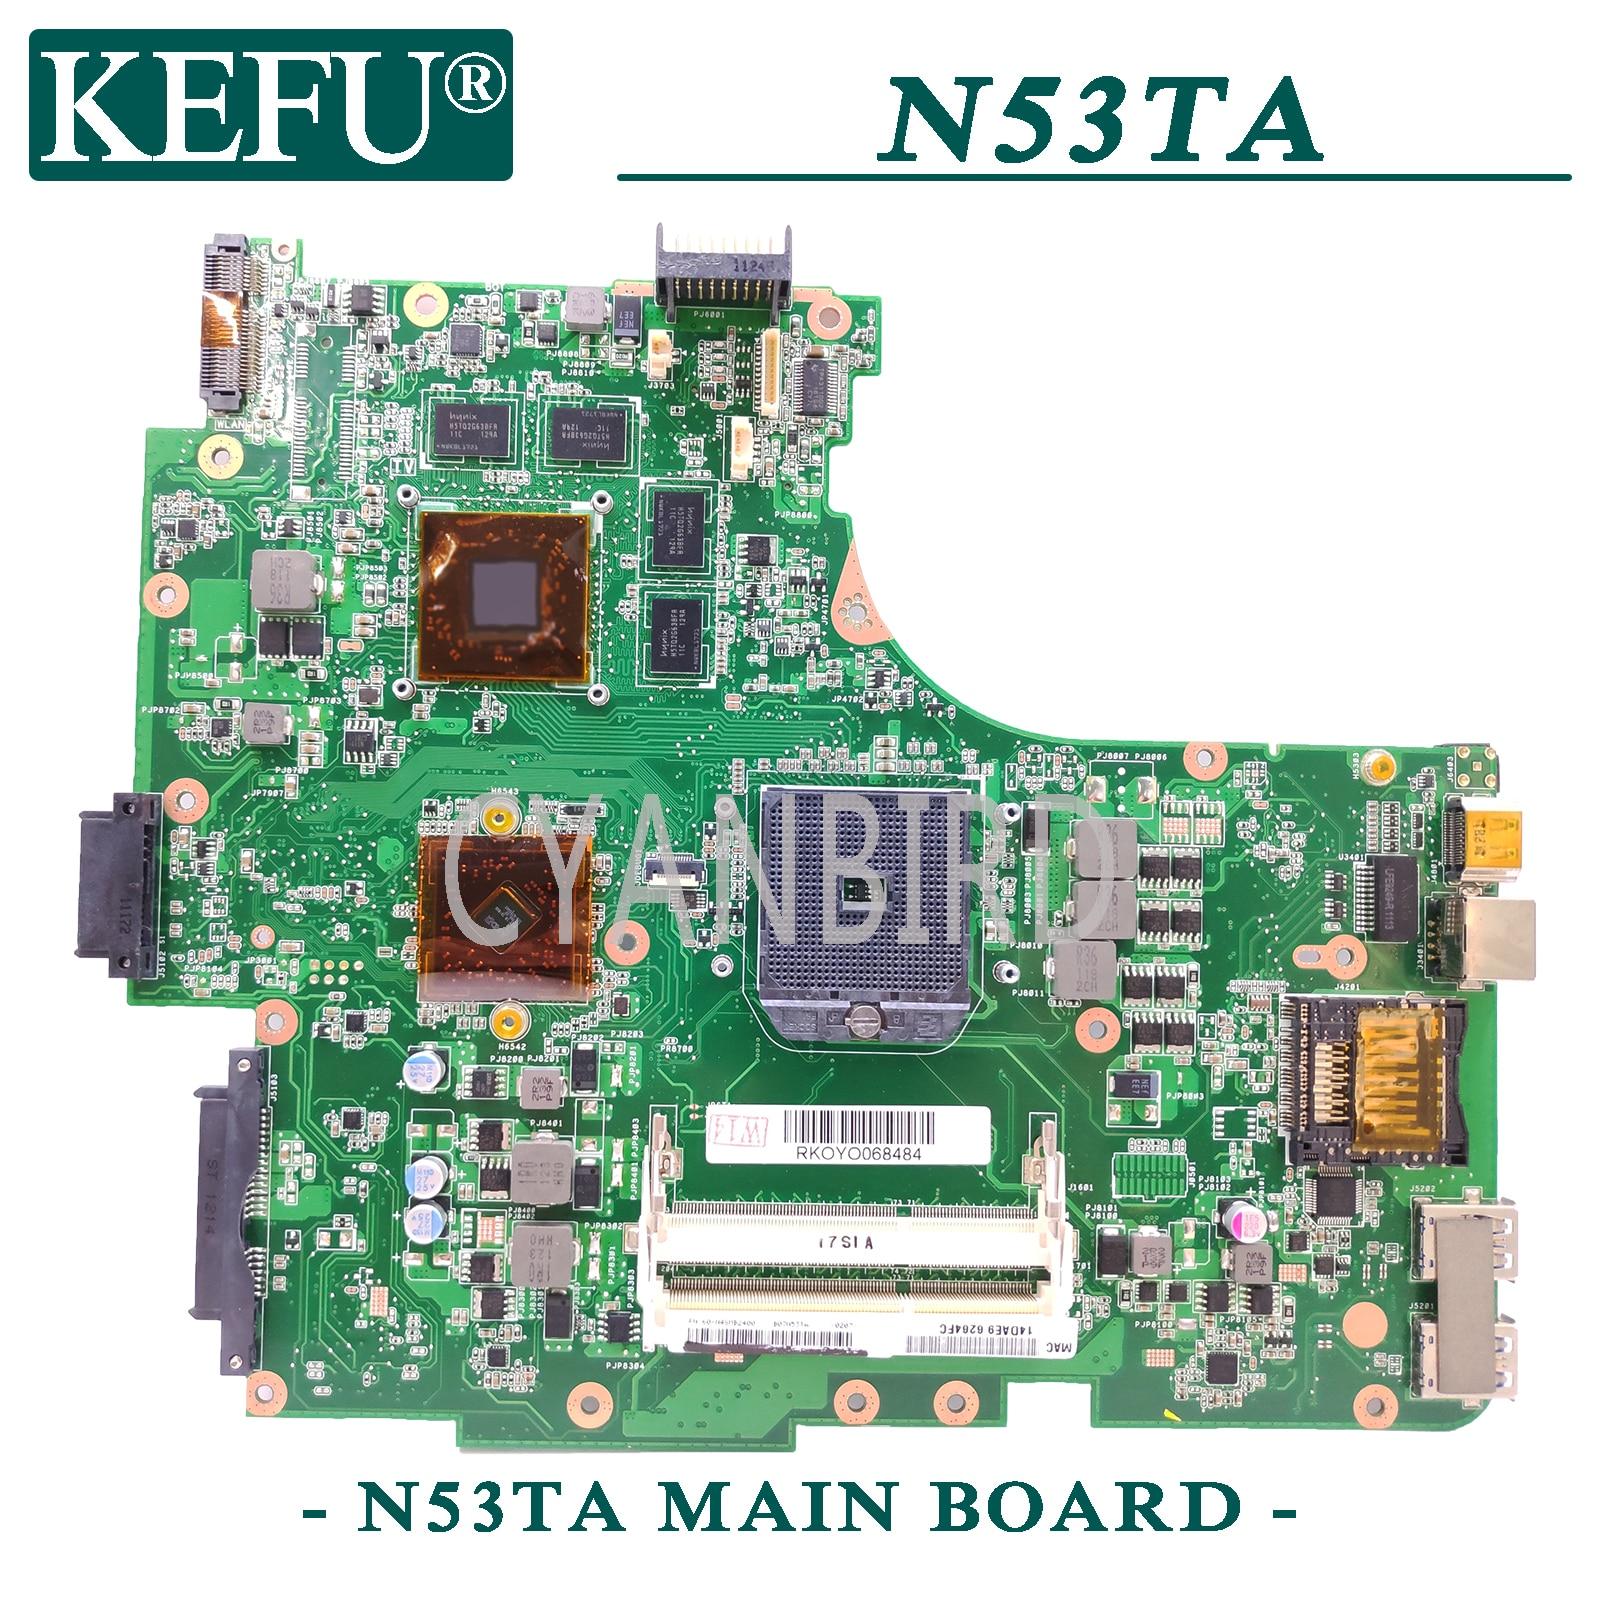 KEFU N53DA اللوحة الأم الأصلية لأجهزة الكمبيوتر المحمول ASUS N53DA N53D اللوحة الأم